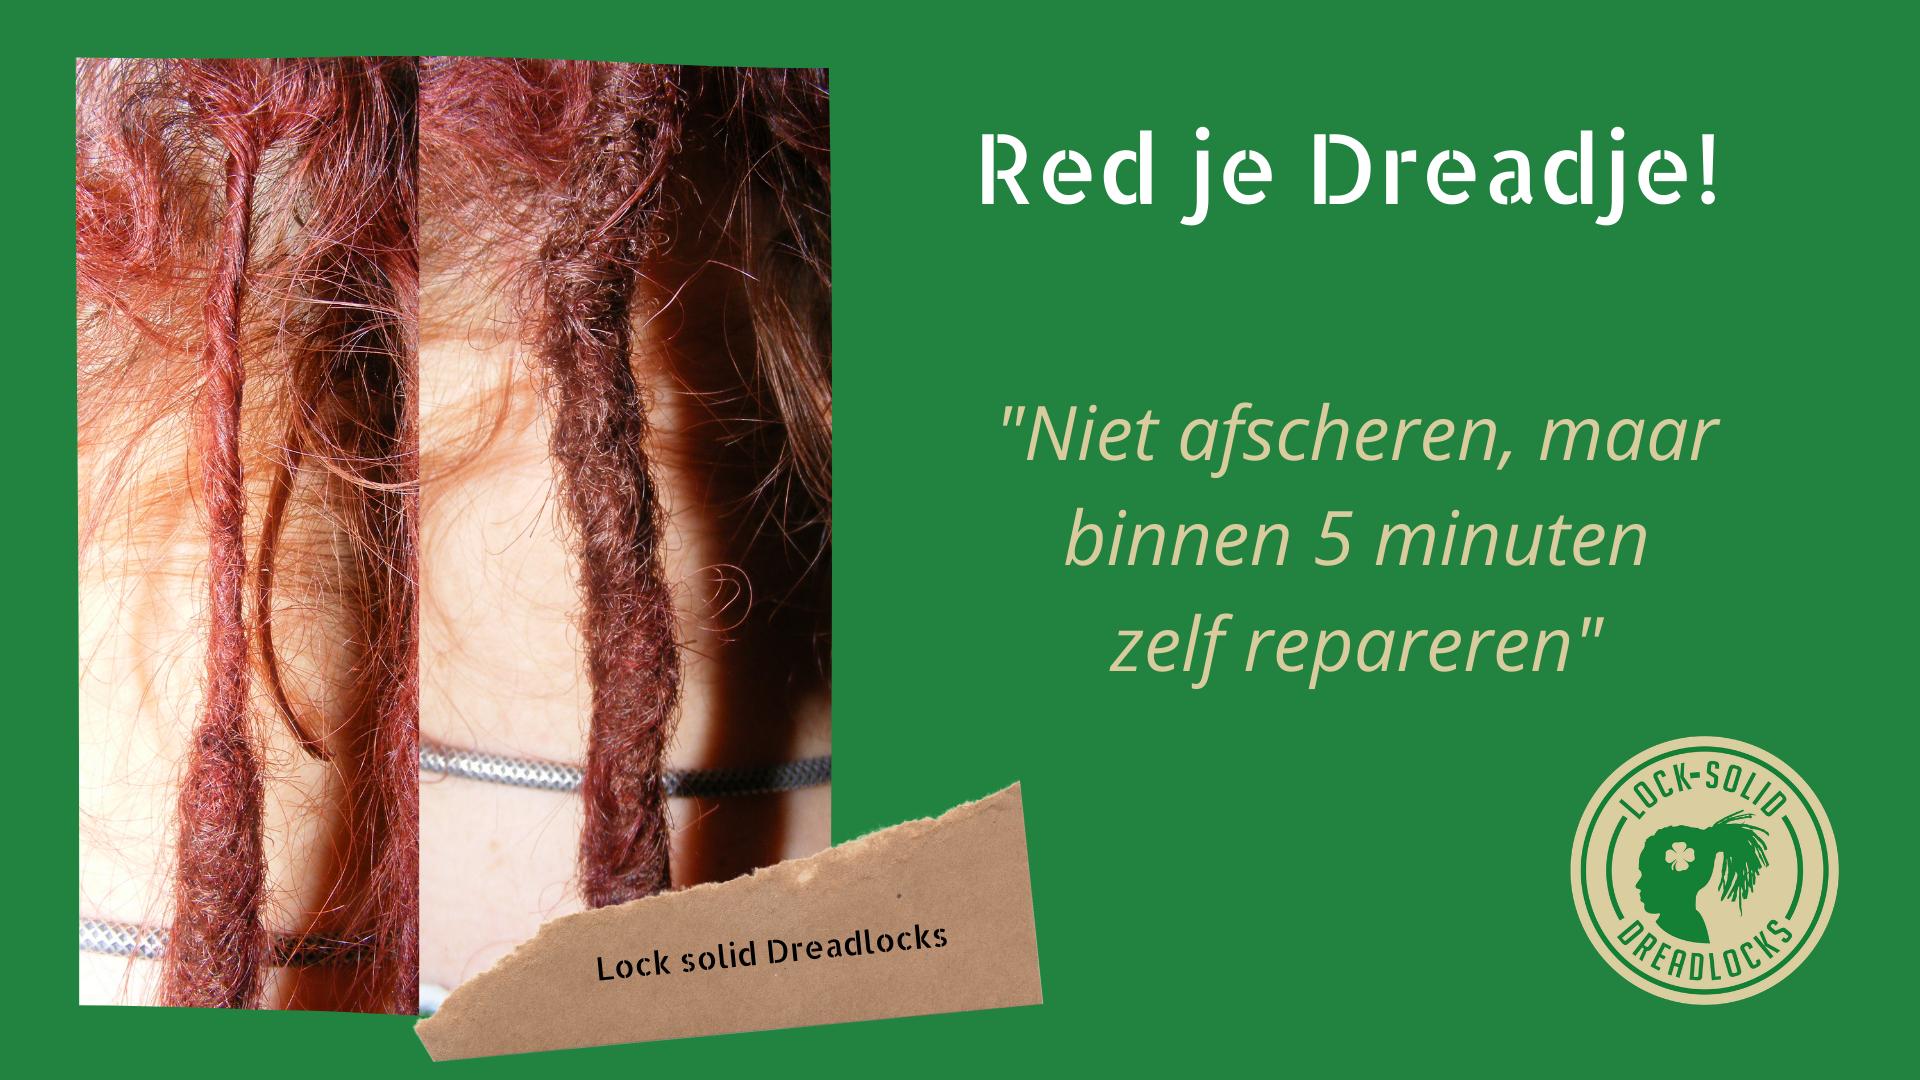 Red je dreadje dreadlock training - dreadkapper rotterdam - Lock Solid Dreadlocks - Alles Voor Dreads - Solid Locks Academy